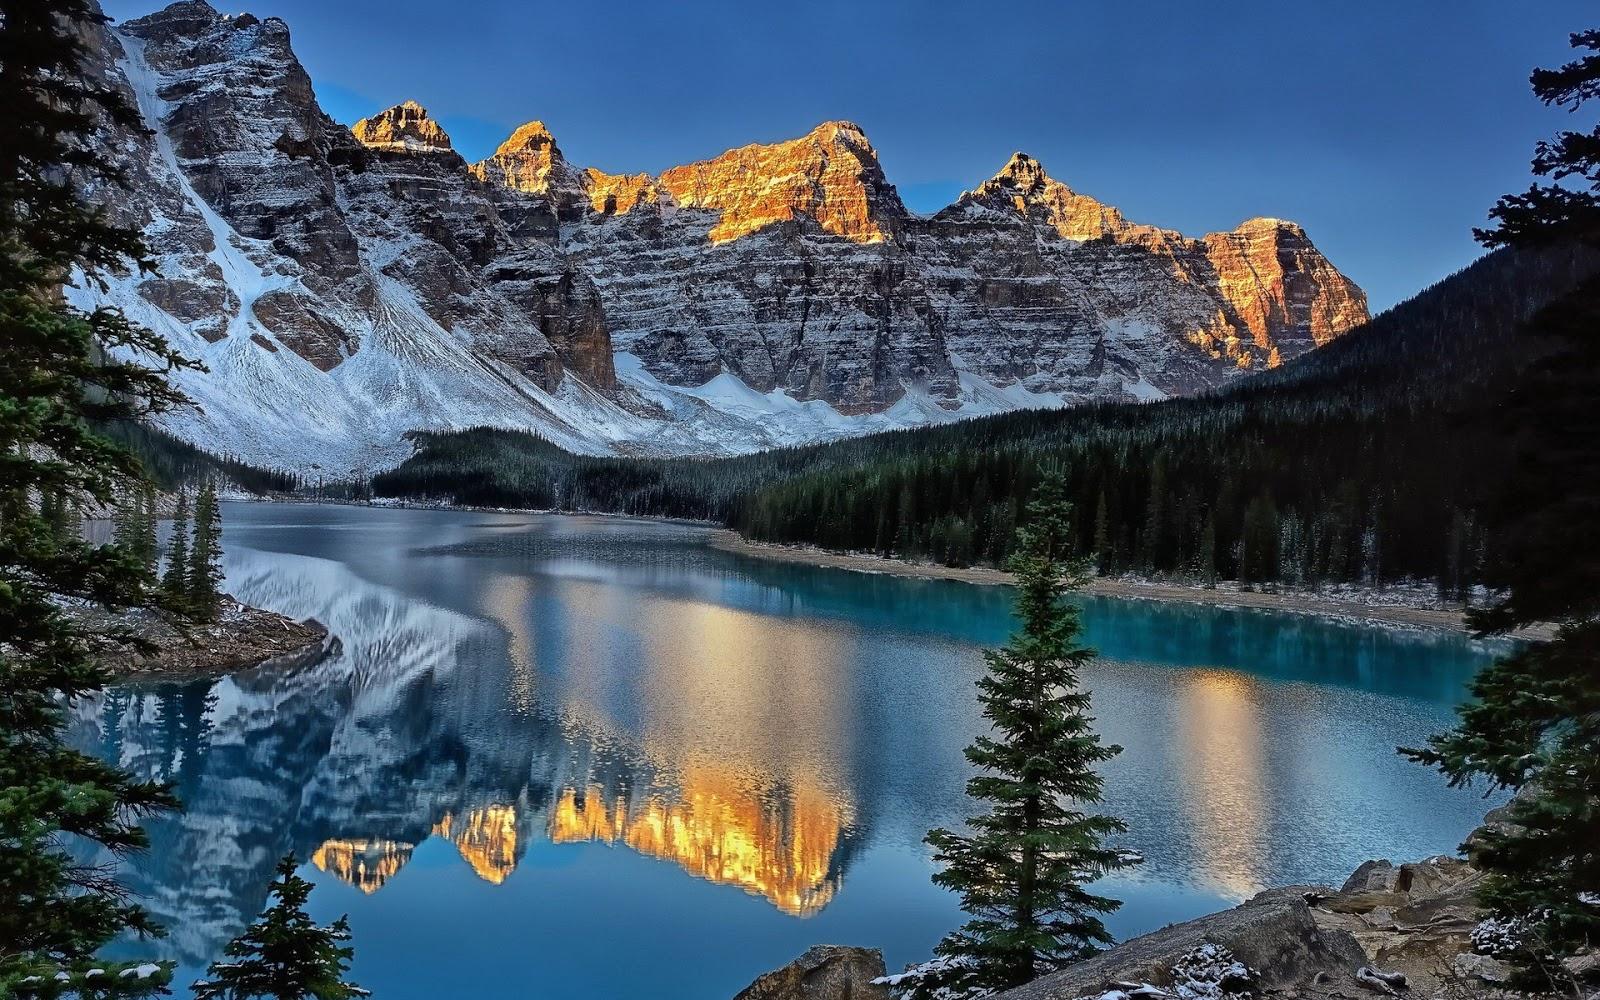 nationalpark alberta kanada - photo #2